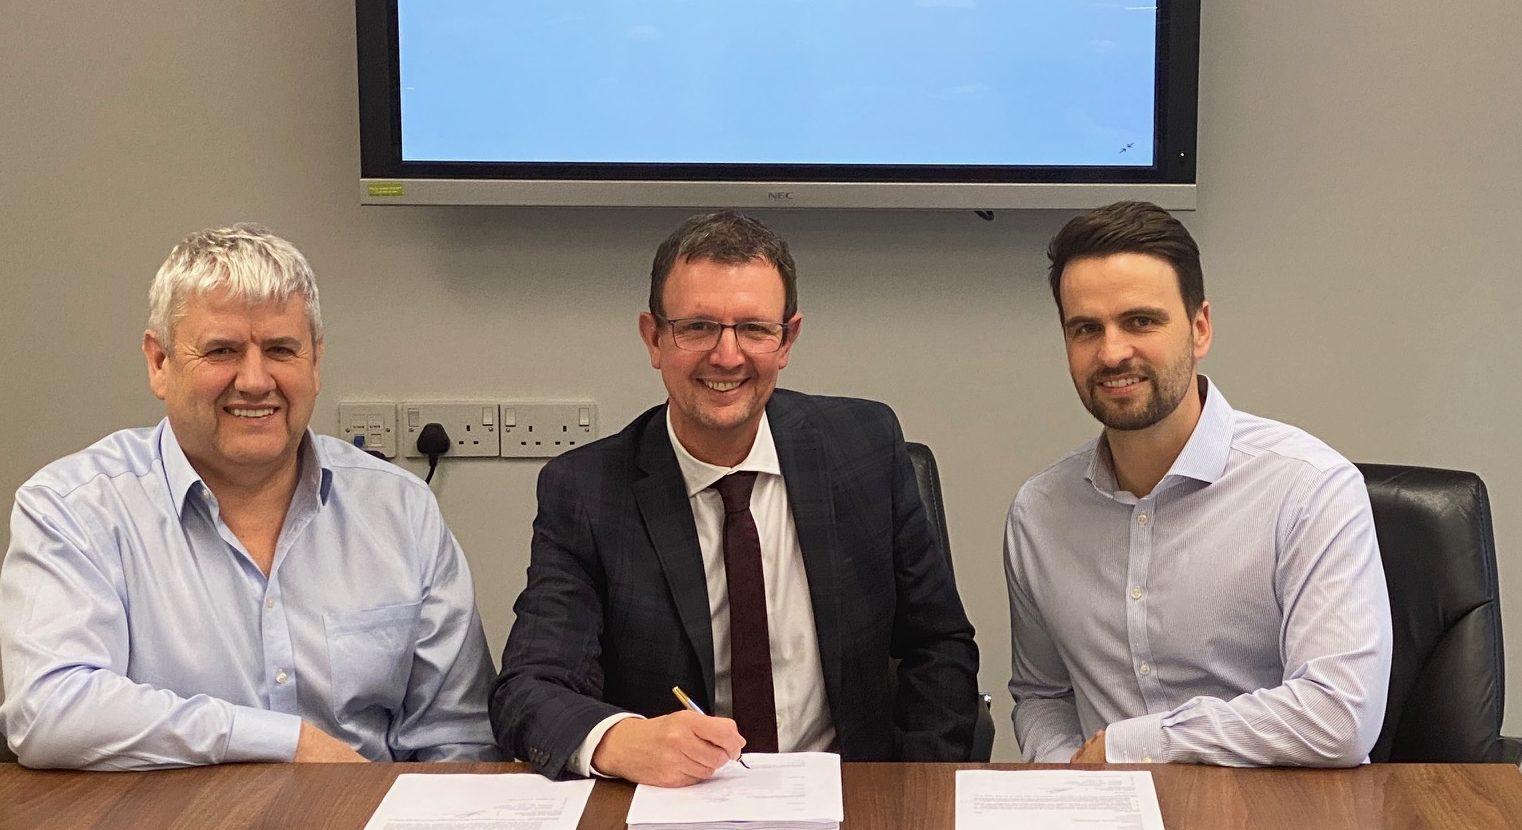 L-R: RSE Group managing director, Allan Dallas; Aciem managing director, Martin Whitfield, and: Envoy managing partner, Iain MacGregor.